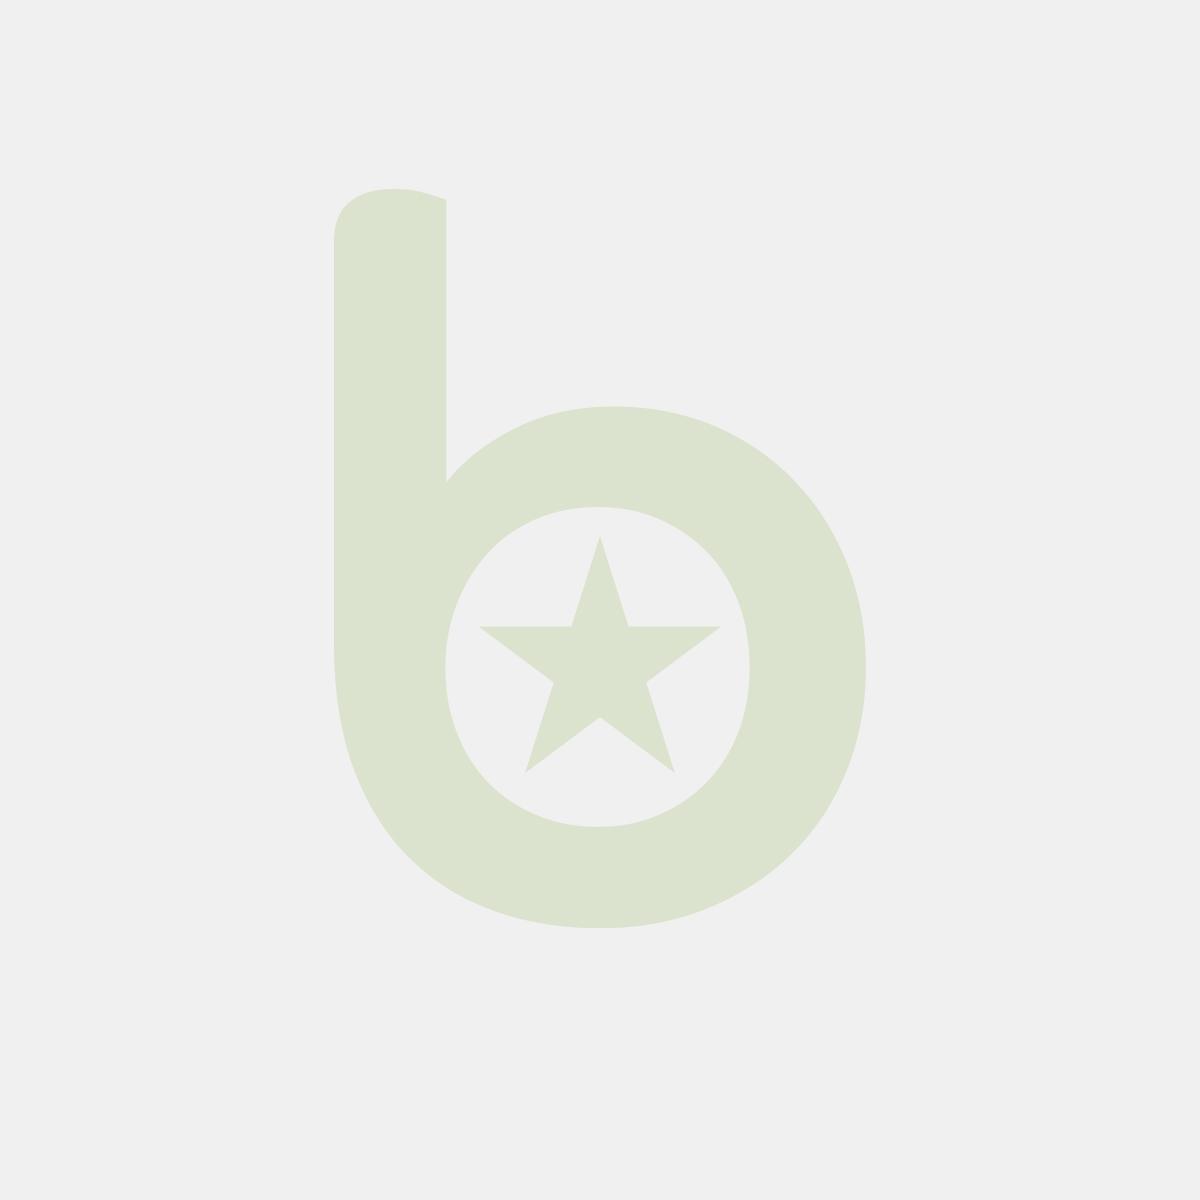 FINGERFOOD - pucharek PS czarny 120ml 6,7x6,7x5,3 op. 25 sztuk